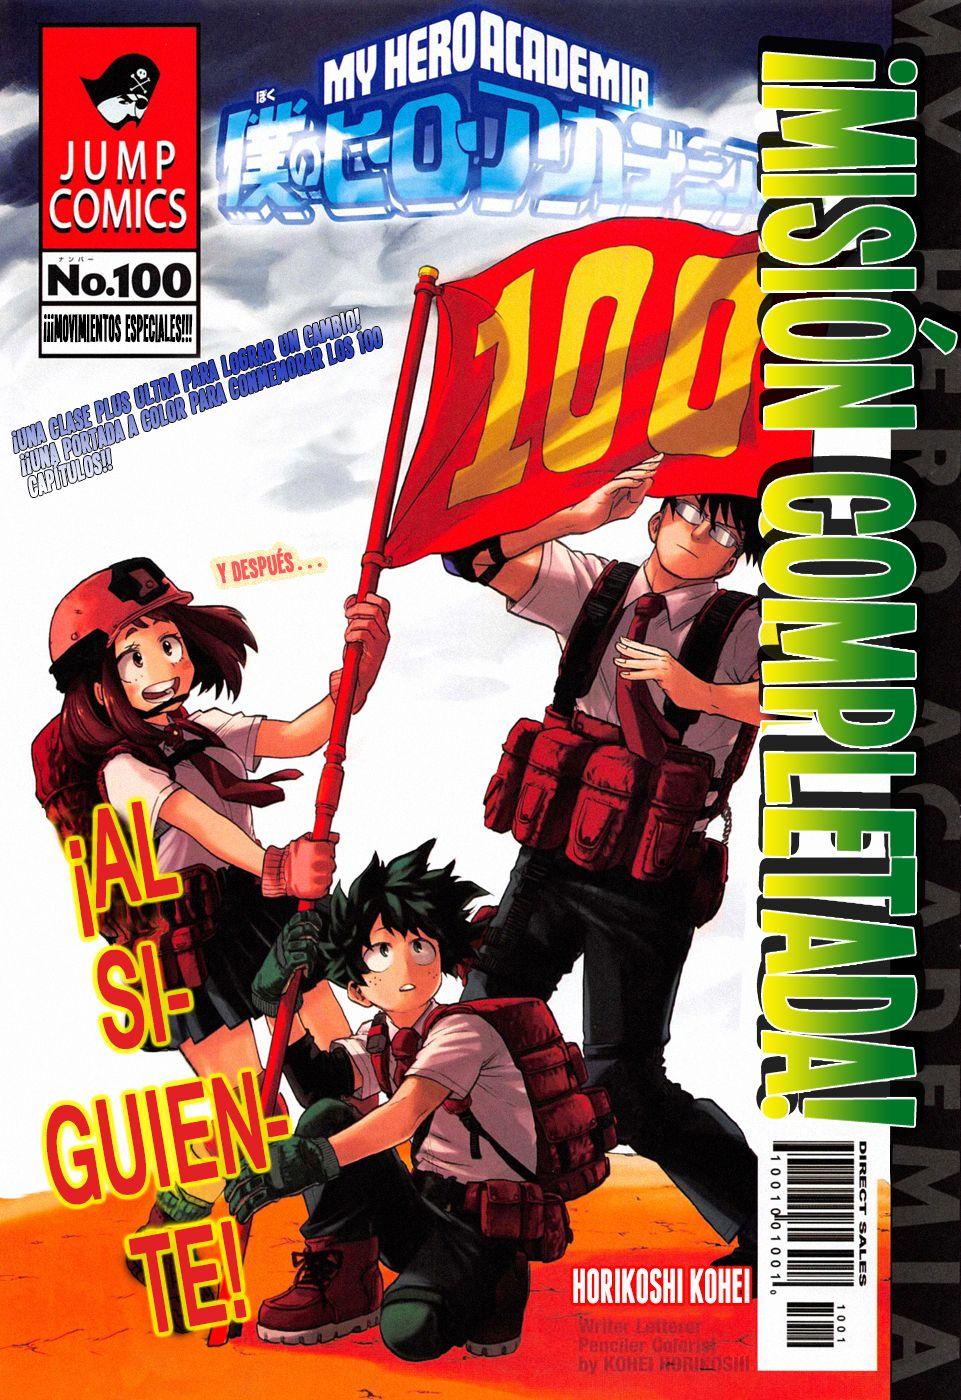 http://c5.ninemanga.com/es_manga/54/182/484822/e6b2e5d385c1503fbd55b97ba5dc4b77.jpg Page 2